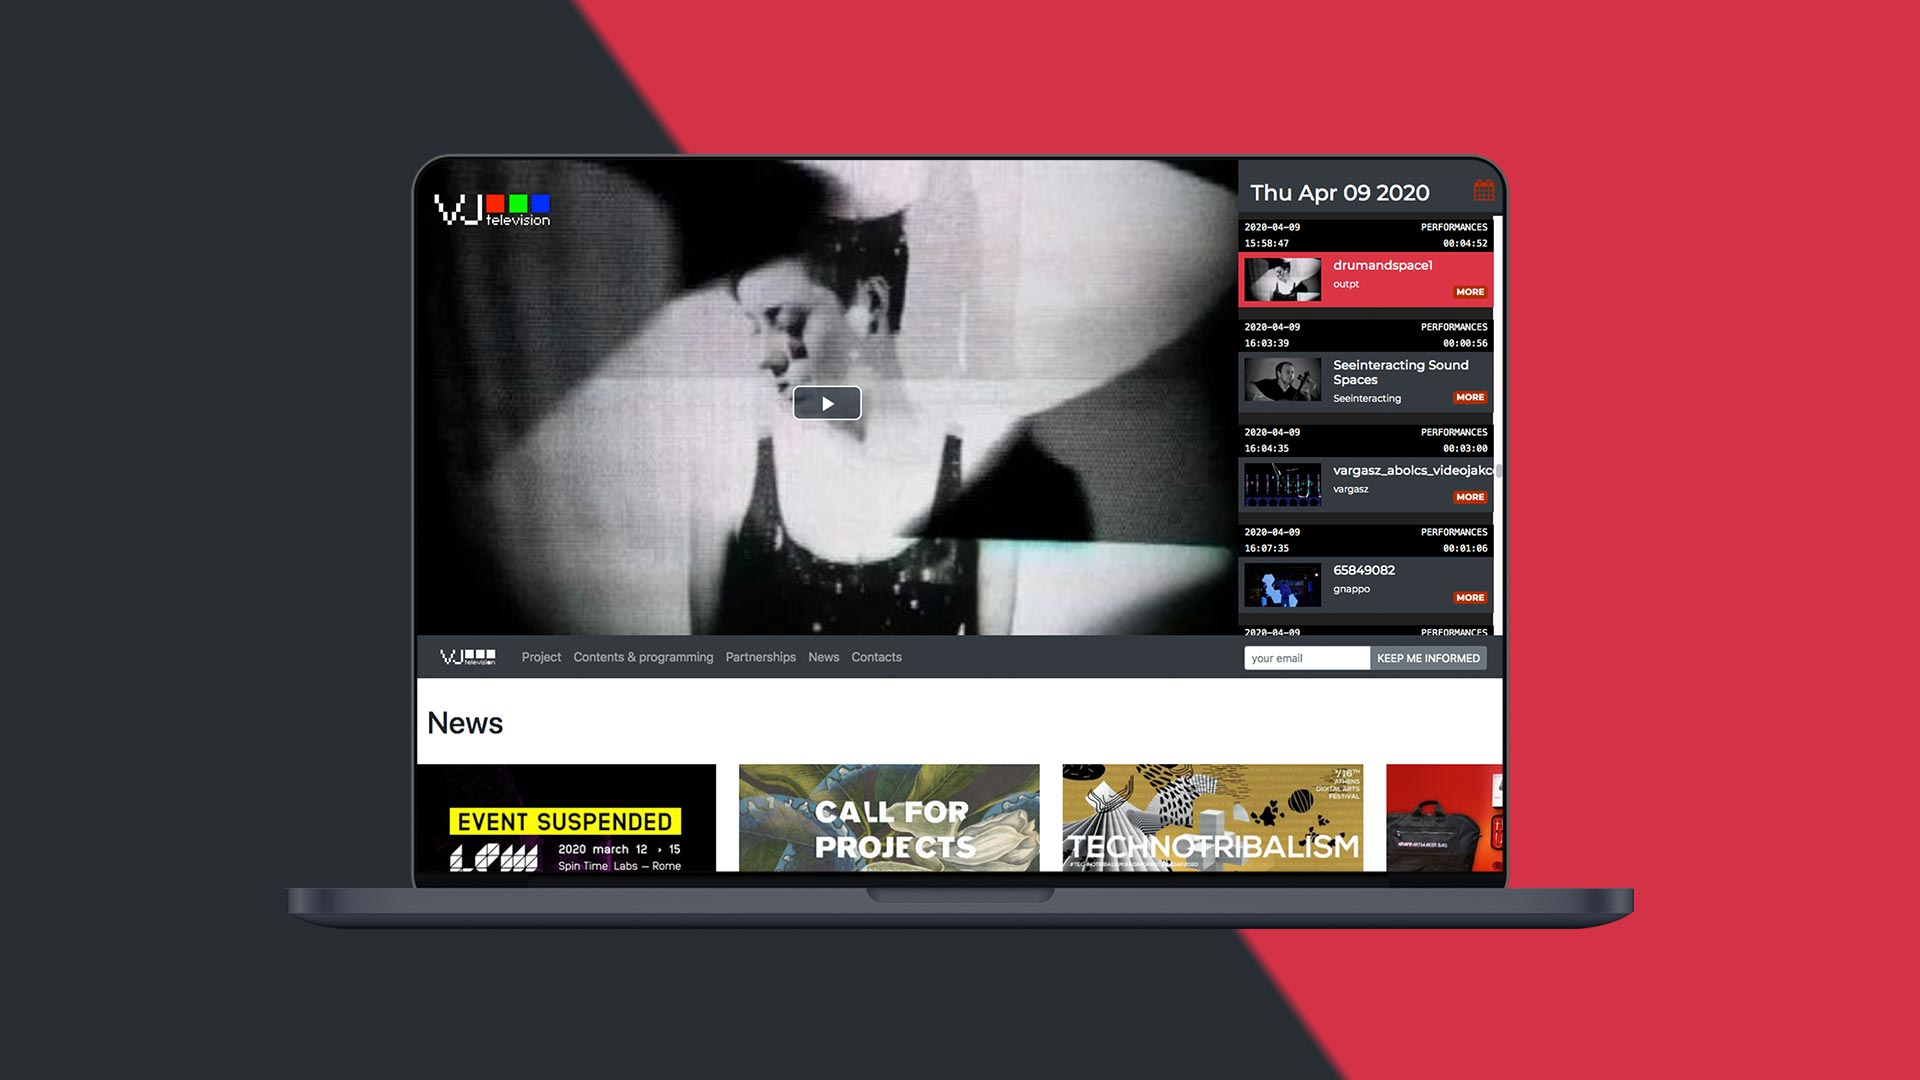 VJ Television